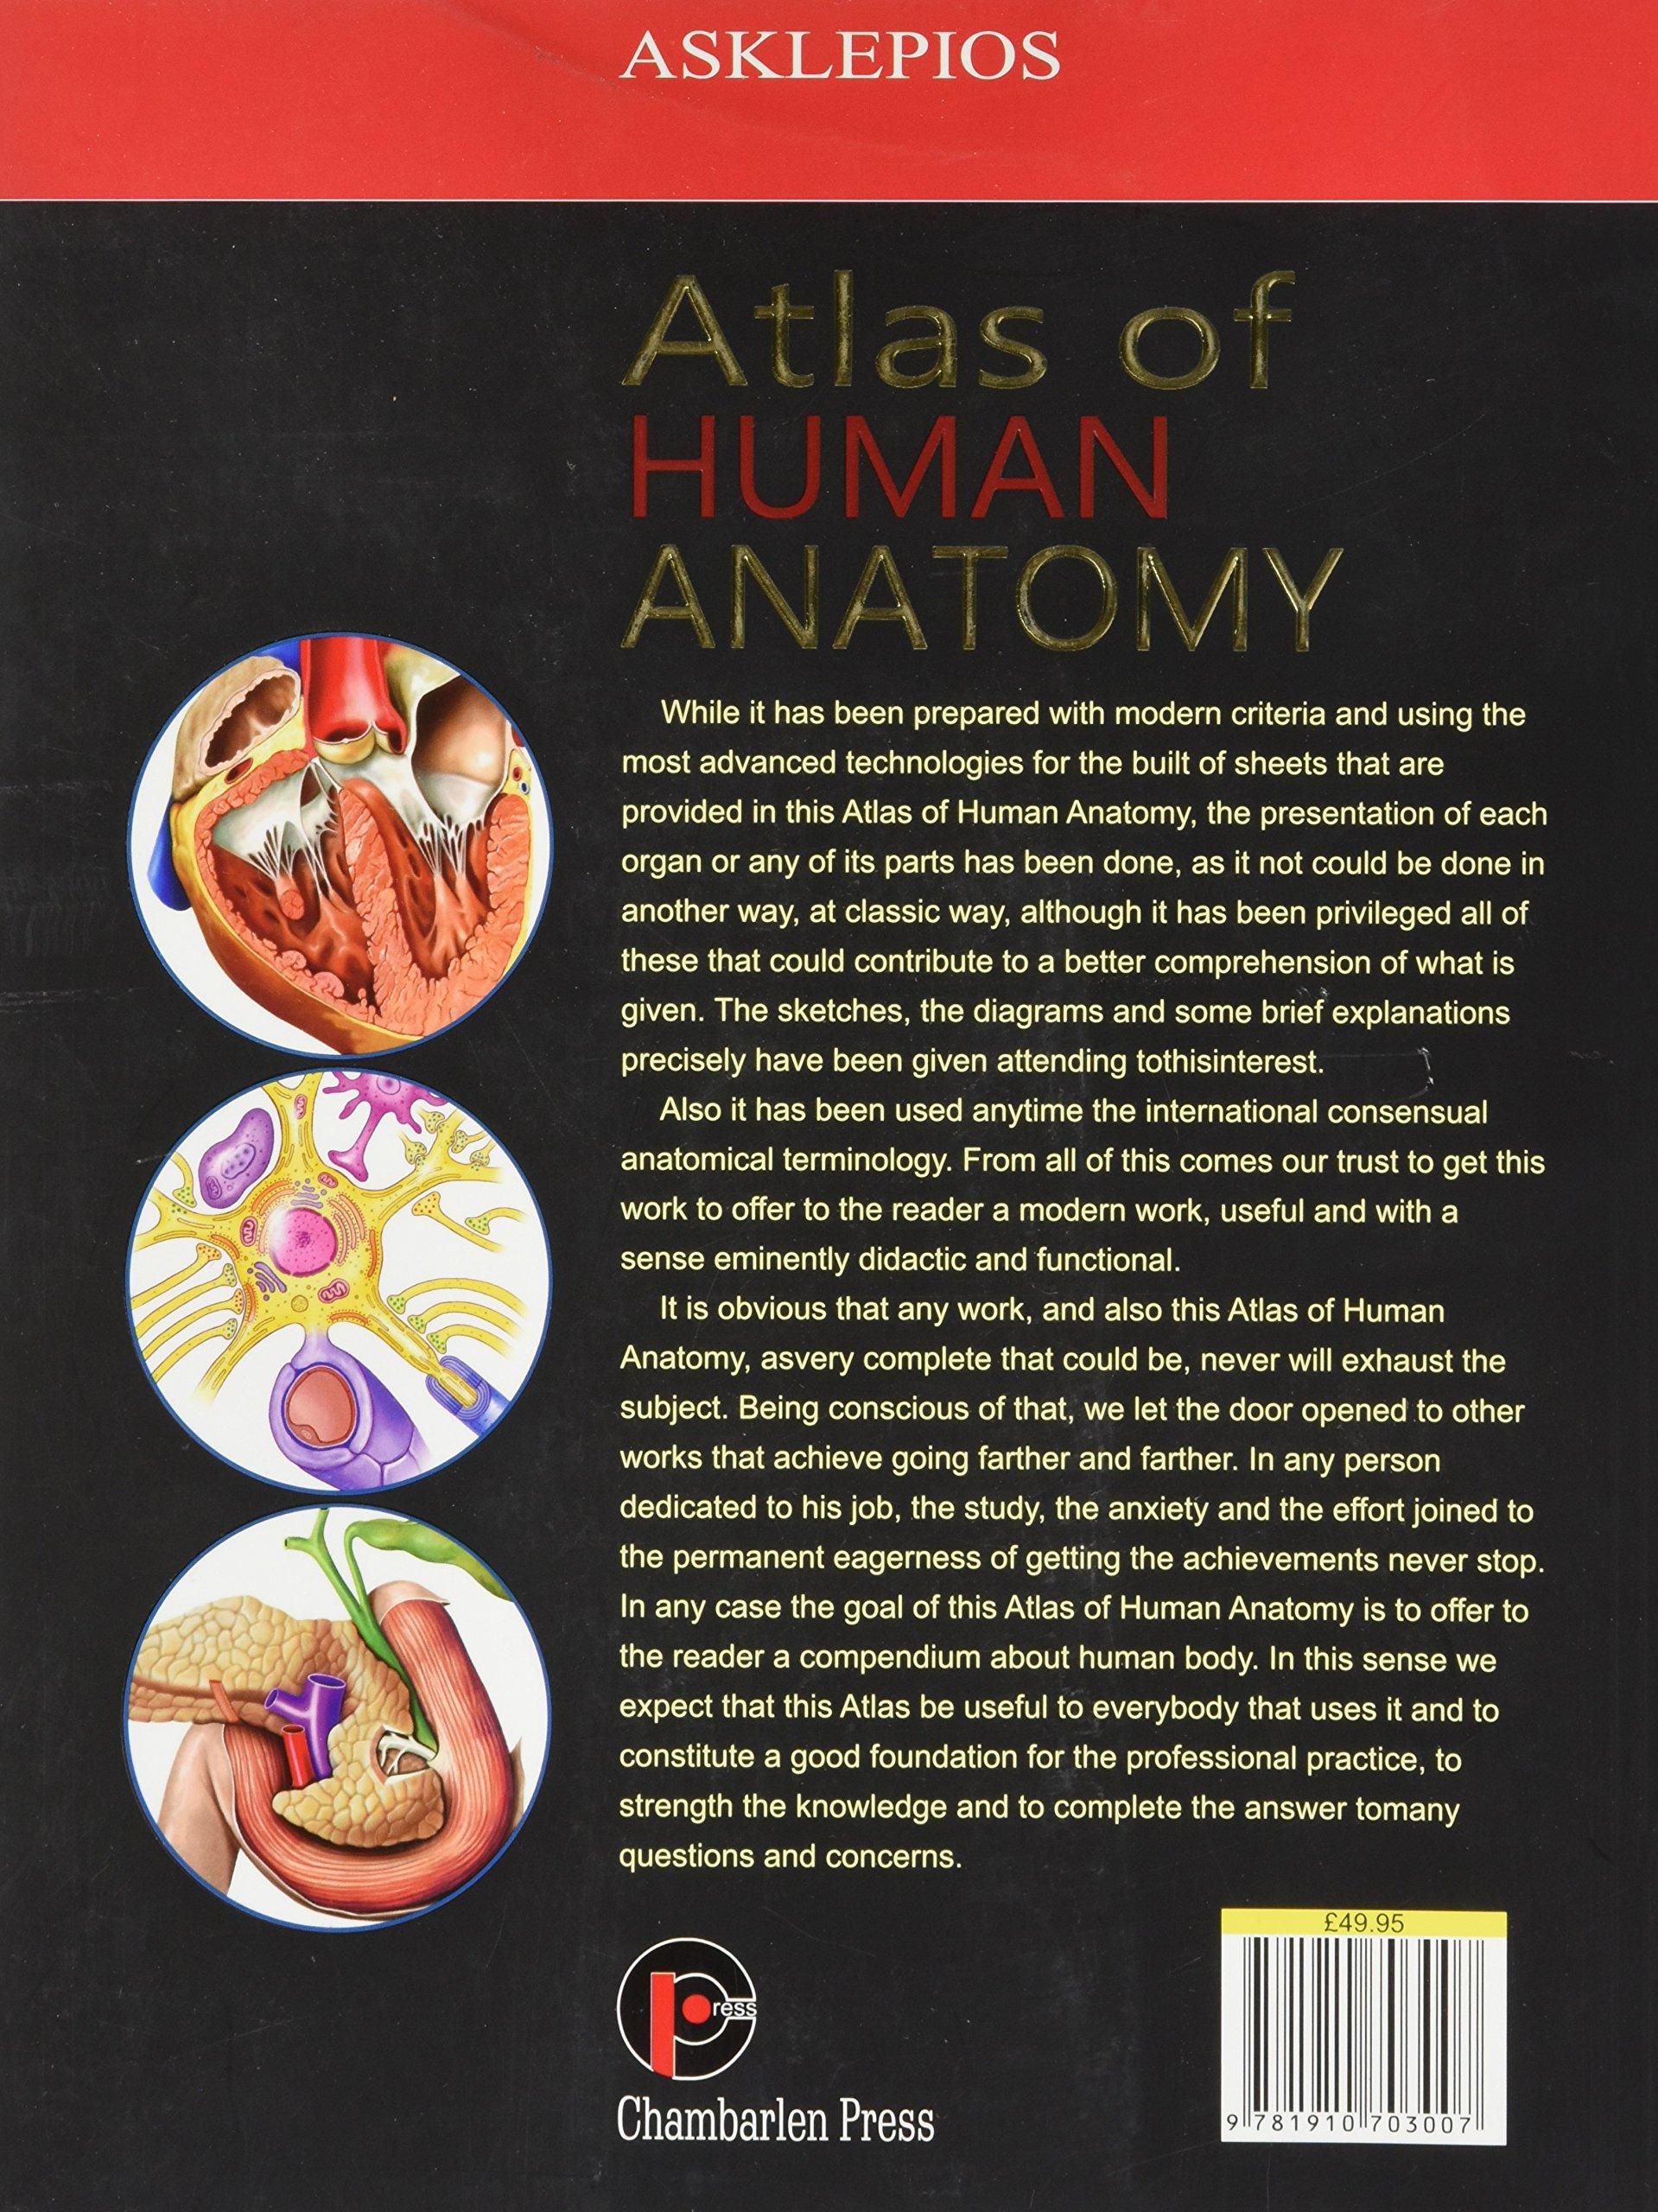 Atlas Of Human Anatomy Jordi Vigue 9781910703007 Amazon Books